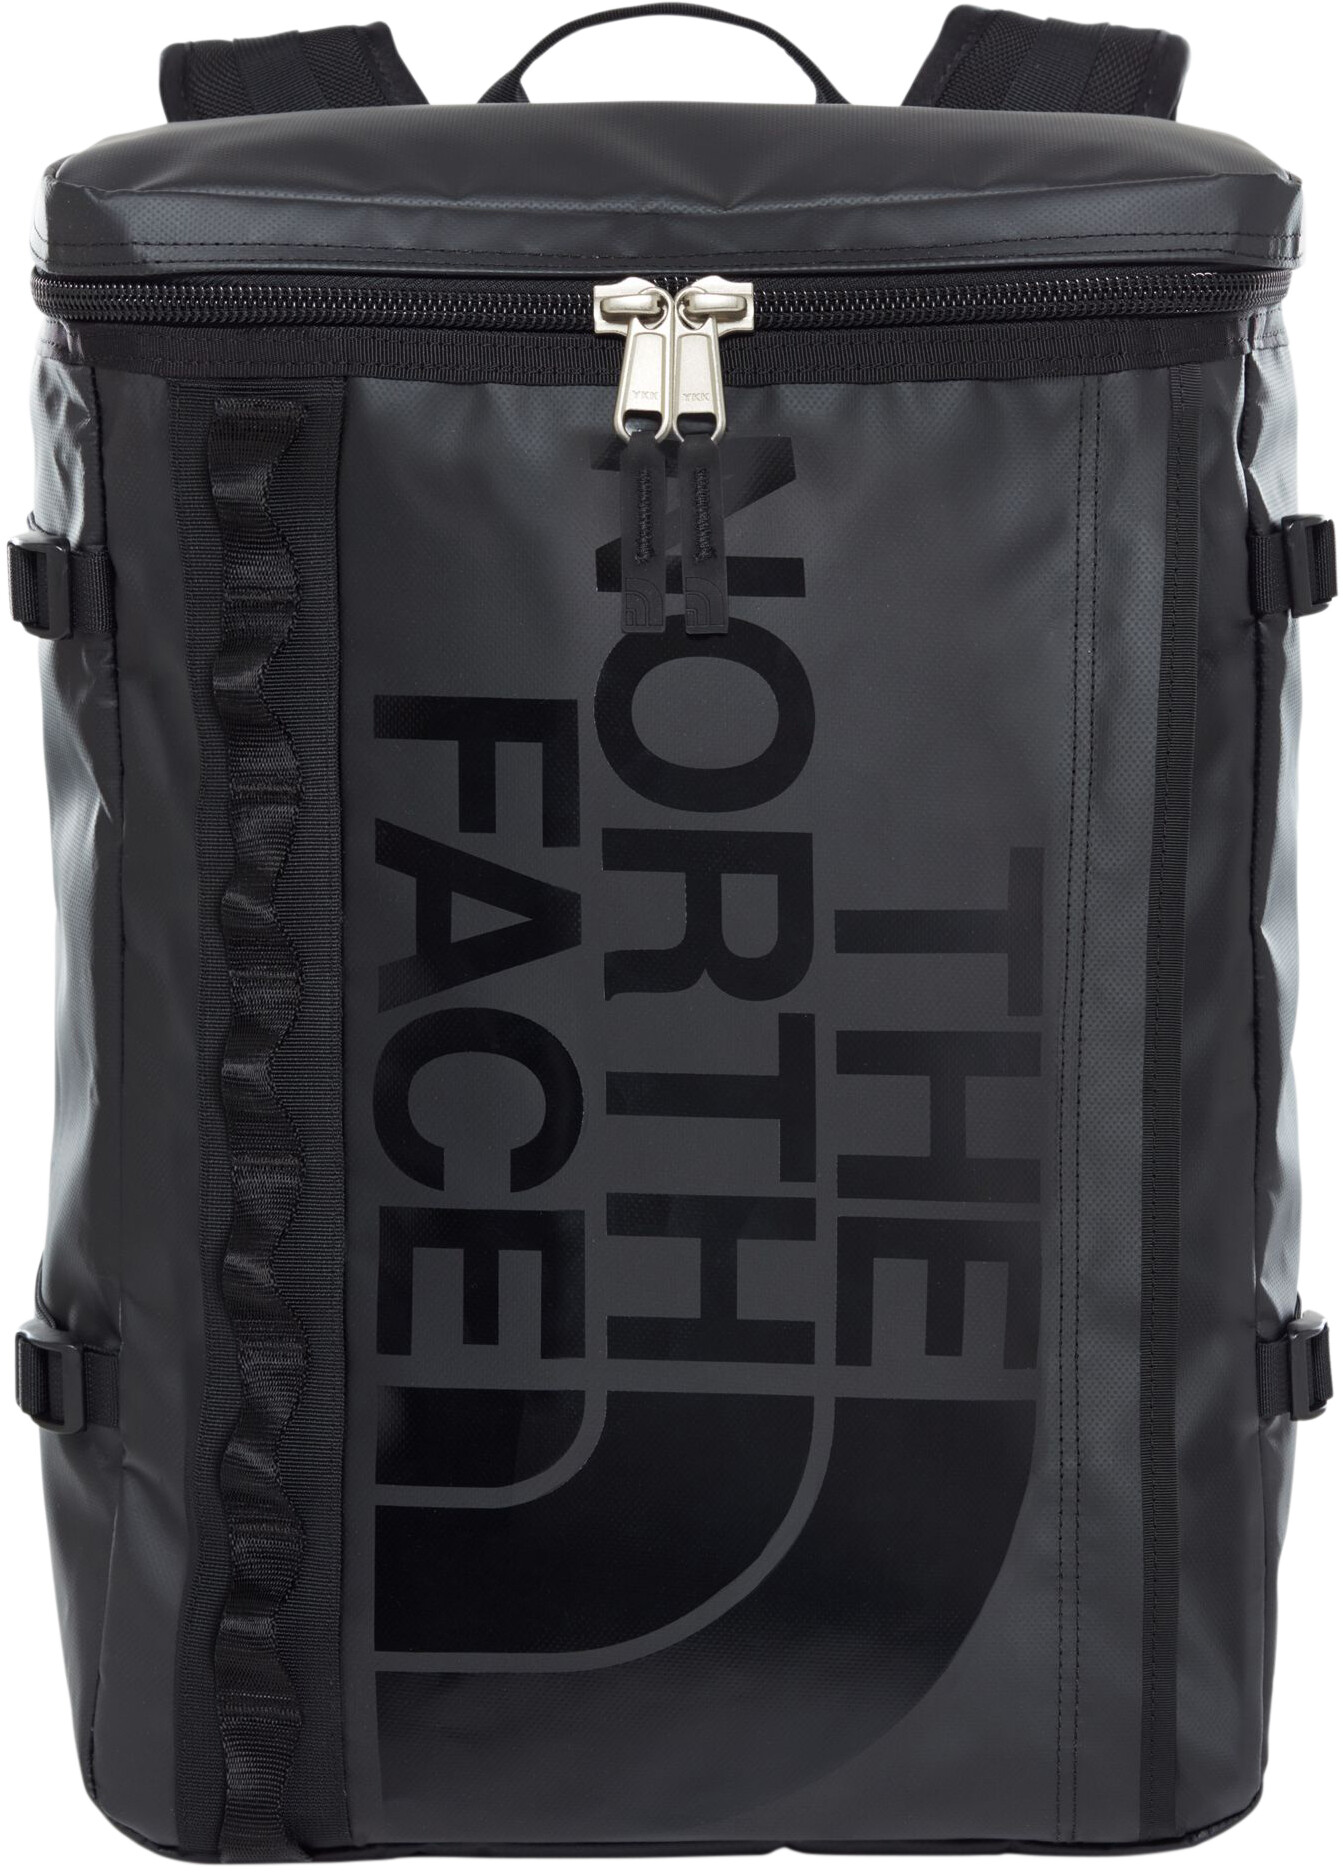 0e7bac4ce The North Face Base Camp Fuse Box Backpack tnf black